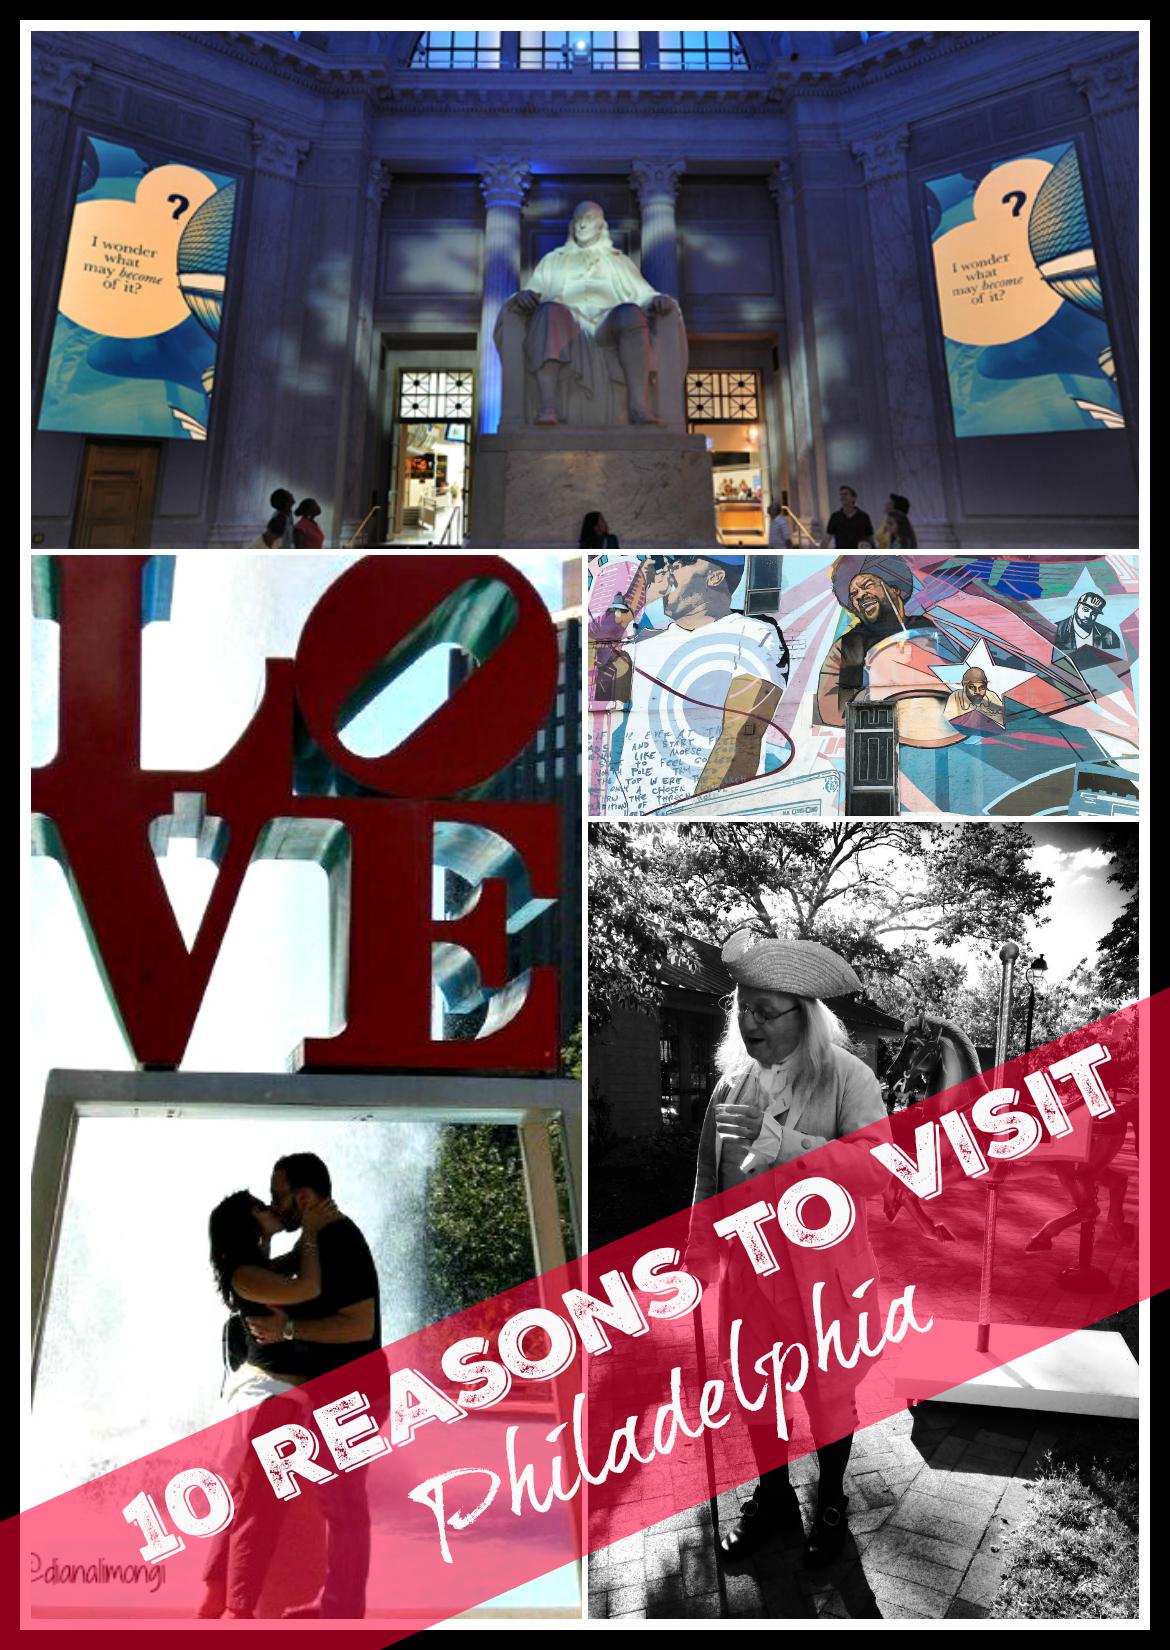 10 reasons to visit Philadelphia